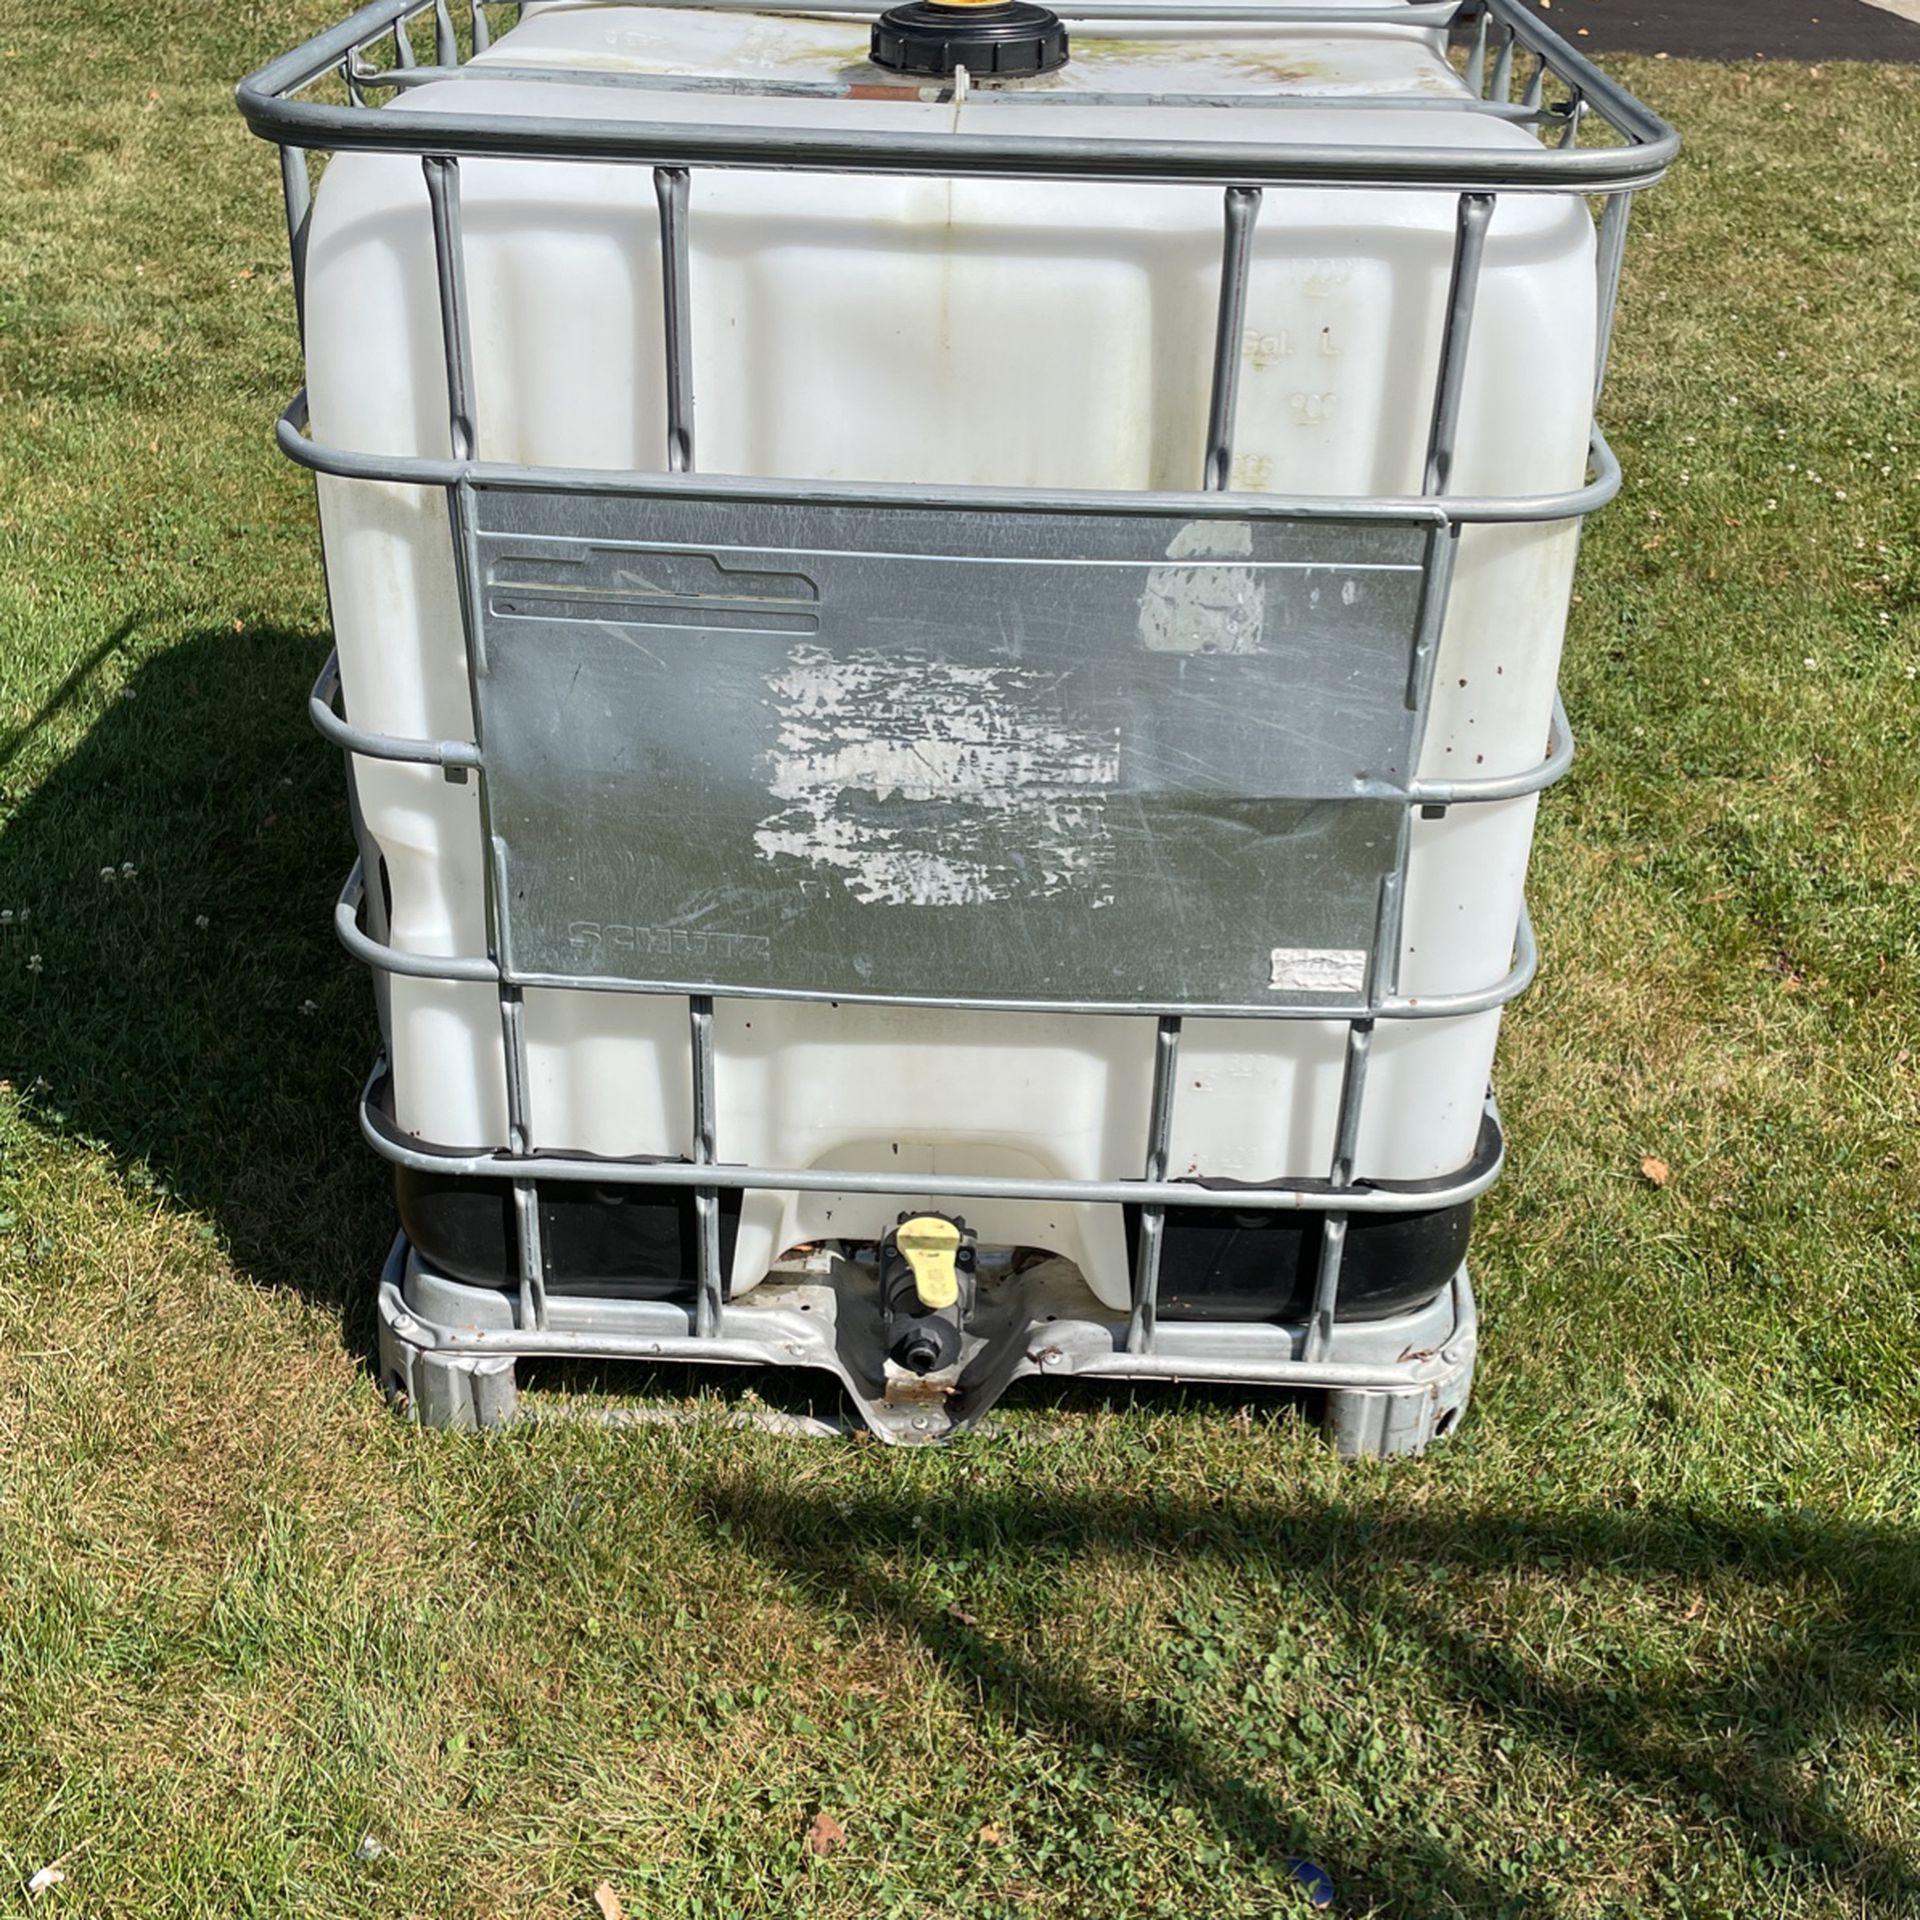 250 Gallon Water Tank with Garden Hose Attachment